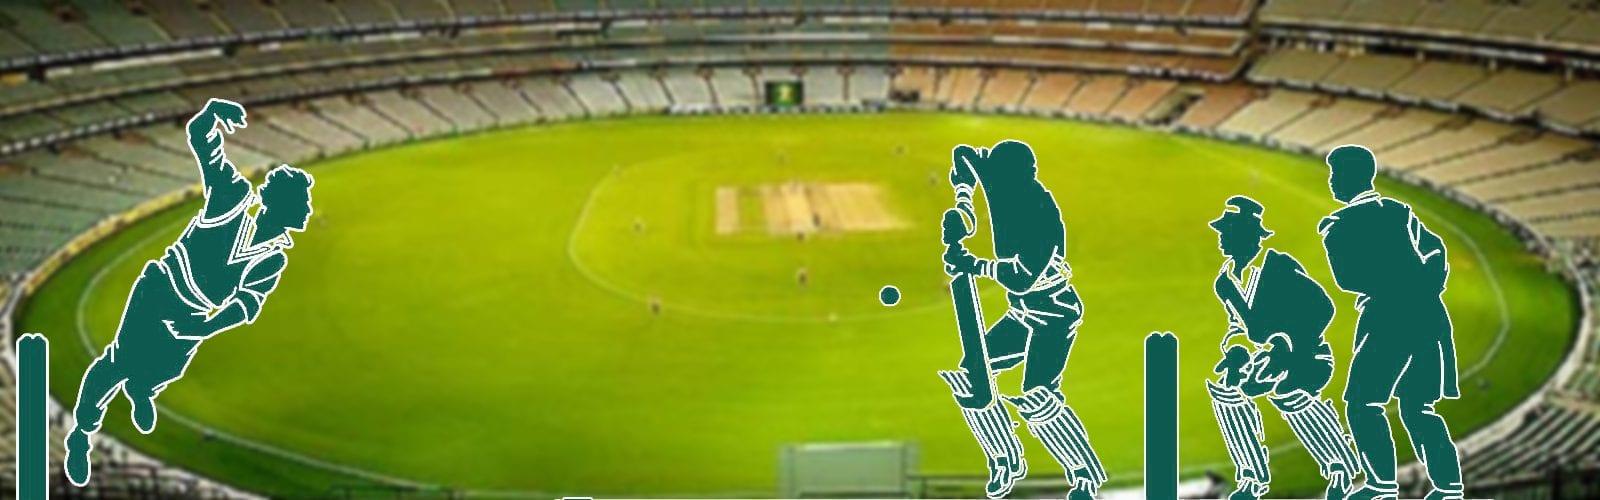 Online cricket Betting tips